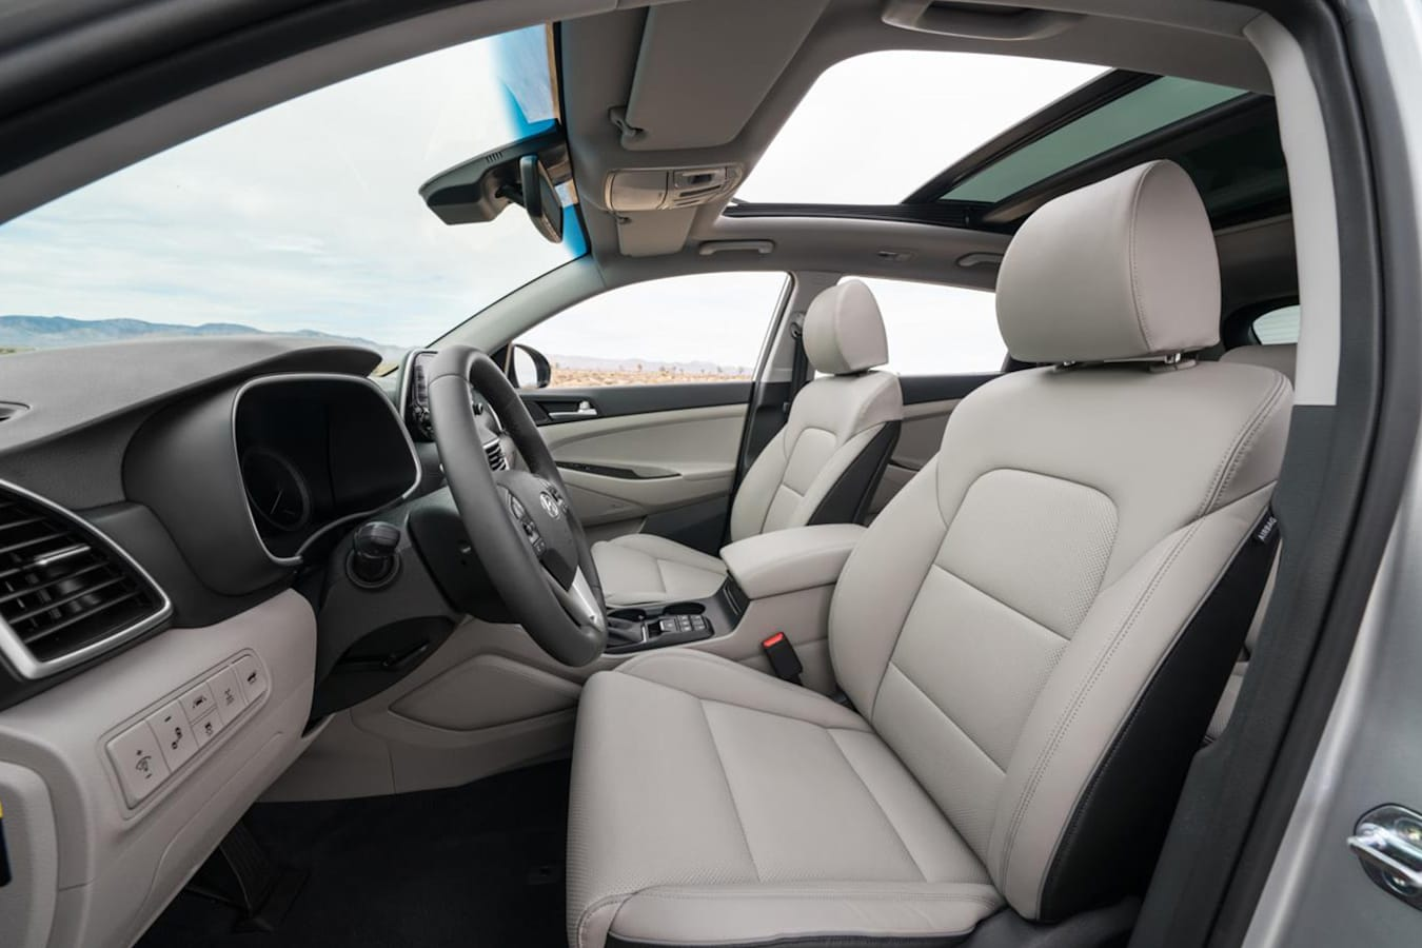 Hyundai Tucson Interior Seats Jpg